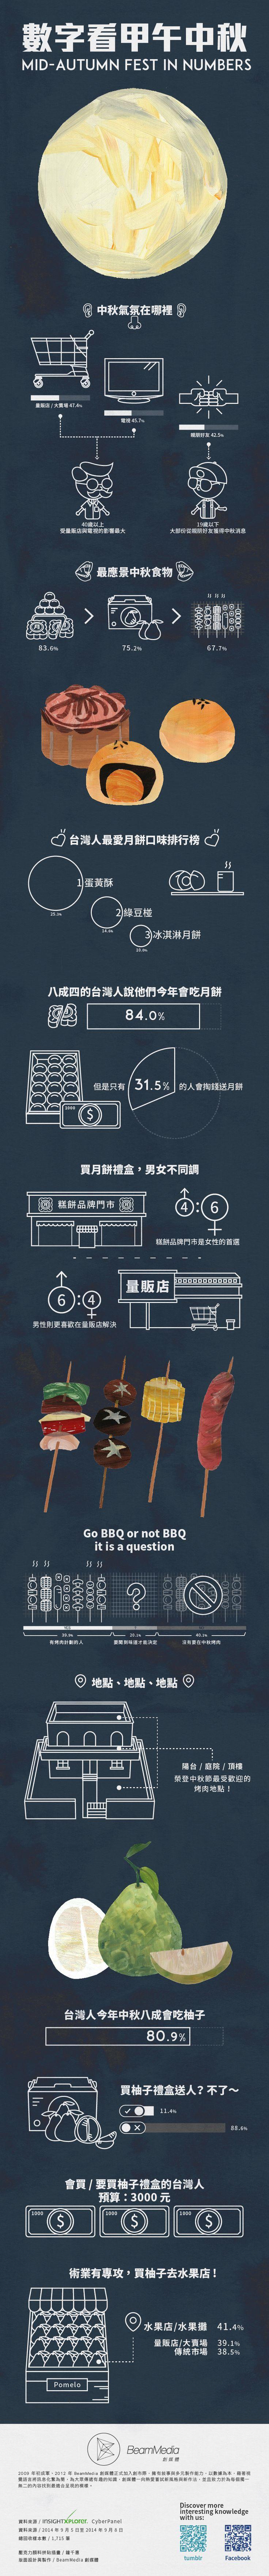 Taiwanese's Mid-Autumn Festival in Numbers -- 2014 的中秋,你在哪裡呢?後山純賞月?烤爐顧肉片?因為太好奇現代台灣人的中秋都怎麼過,創媒體與創市際在中秋時分進行了一項小調查,發現多數台灣人心目中的中秋節主角居然是…..